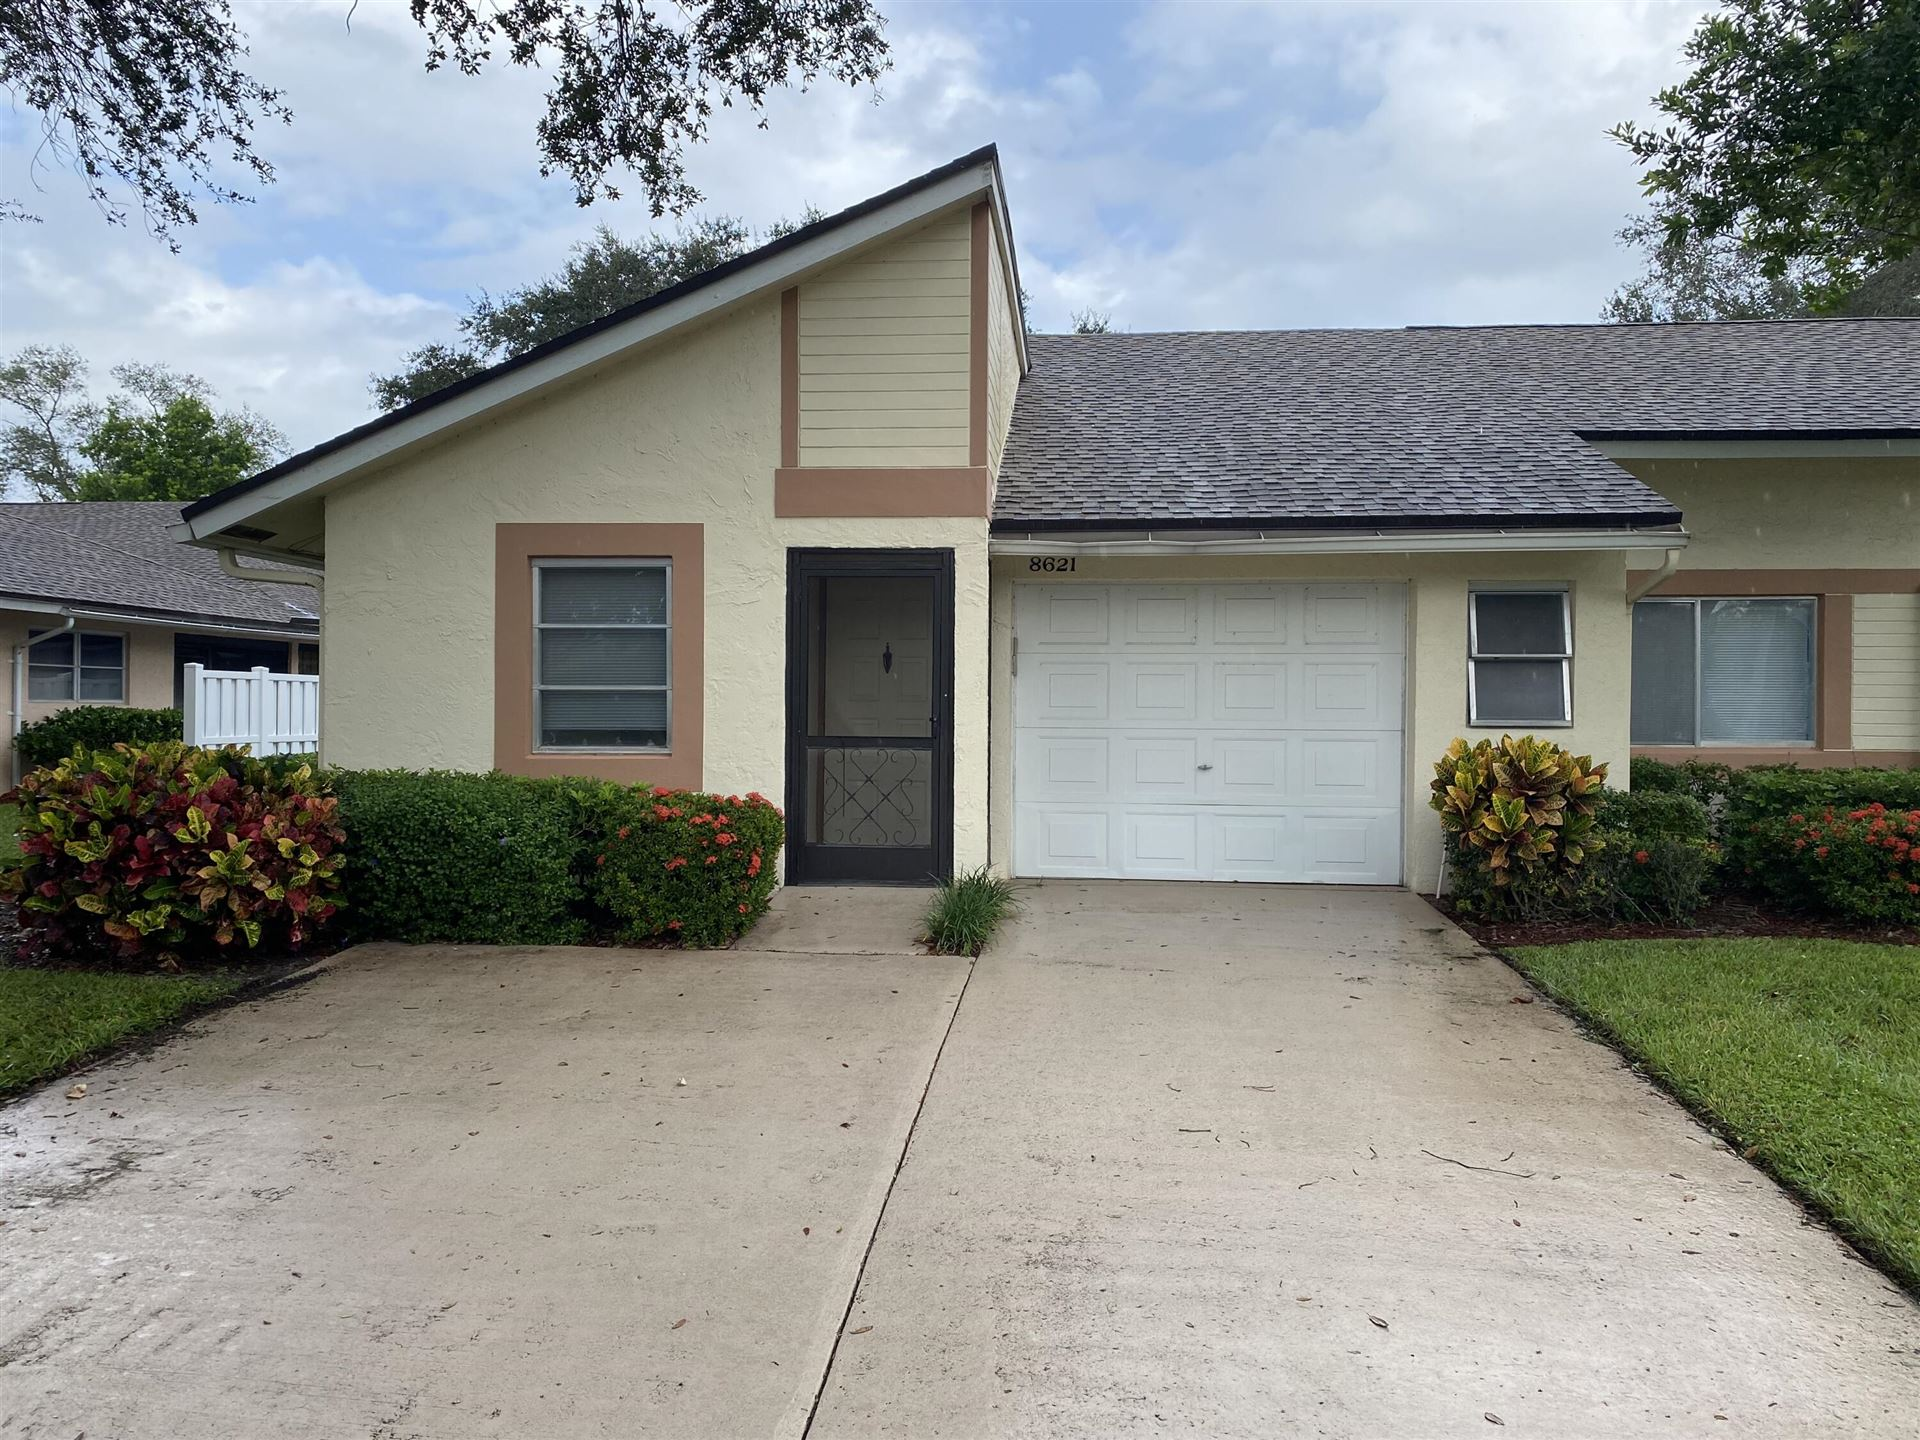 8621 Raintree Court, Boca Raton, FL 33496 - MLS#: RX-10753970